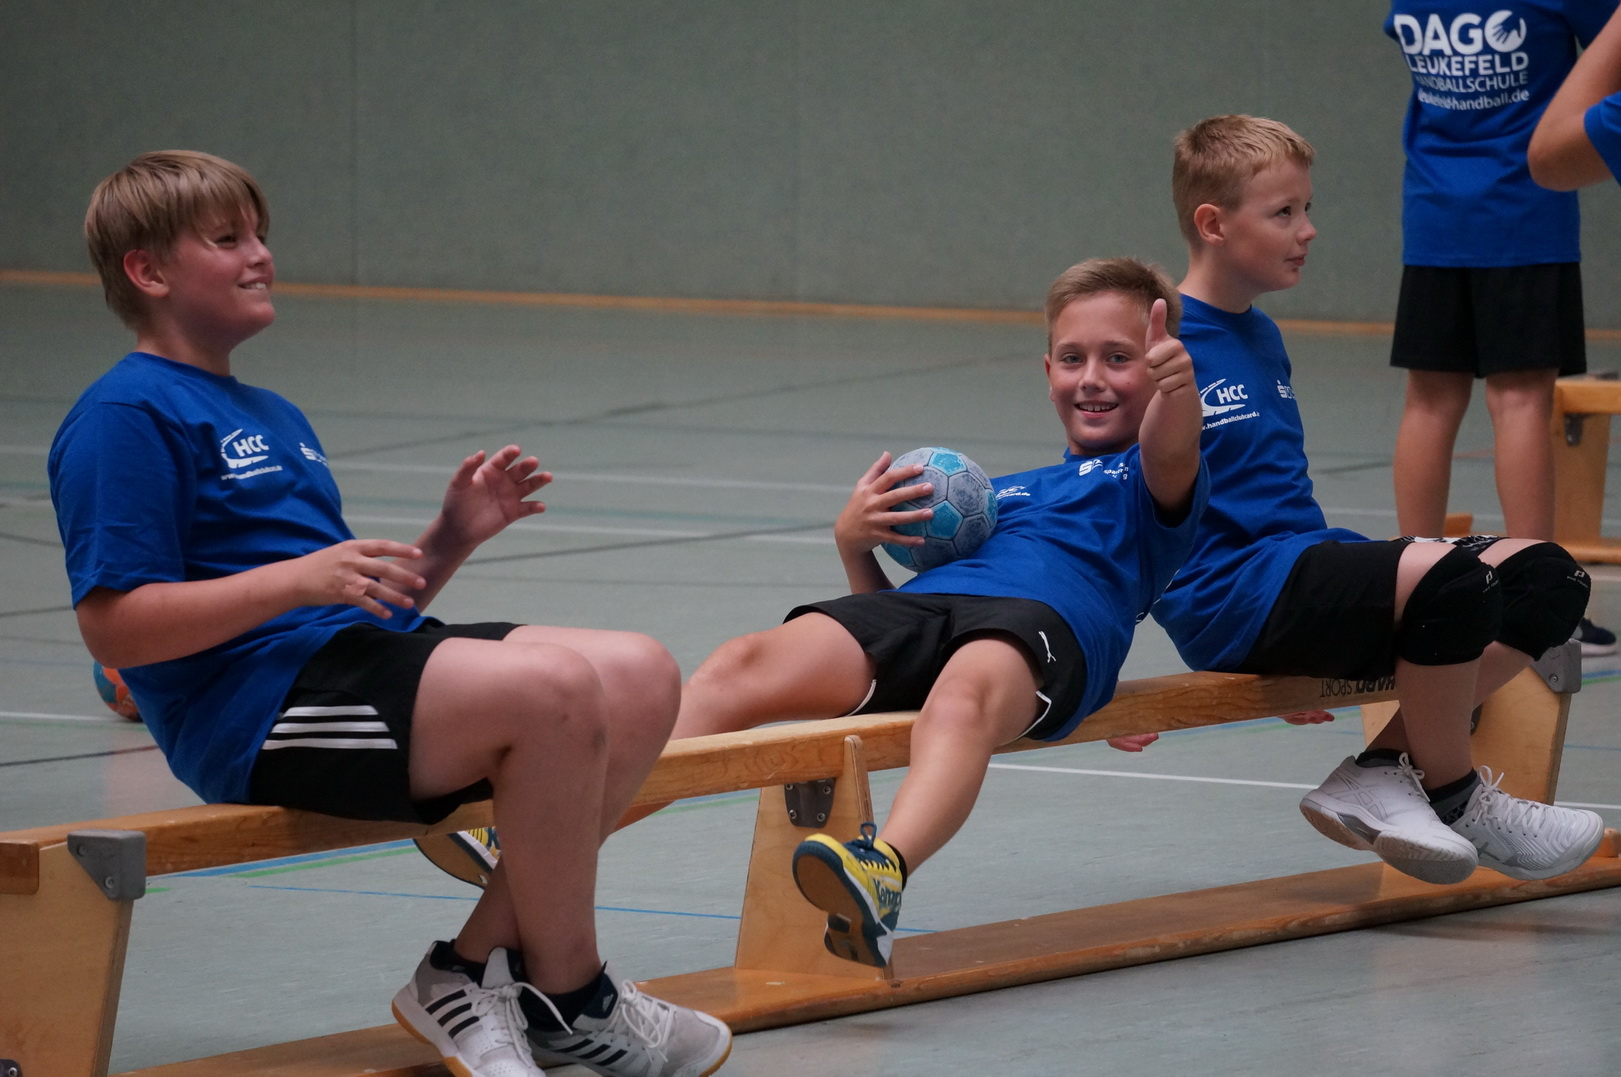 201808_Handballcamp_SDH_MG_190w